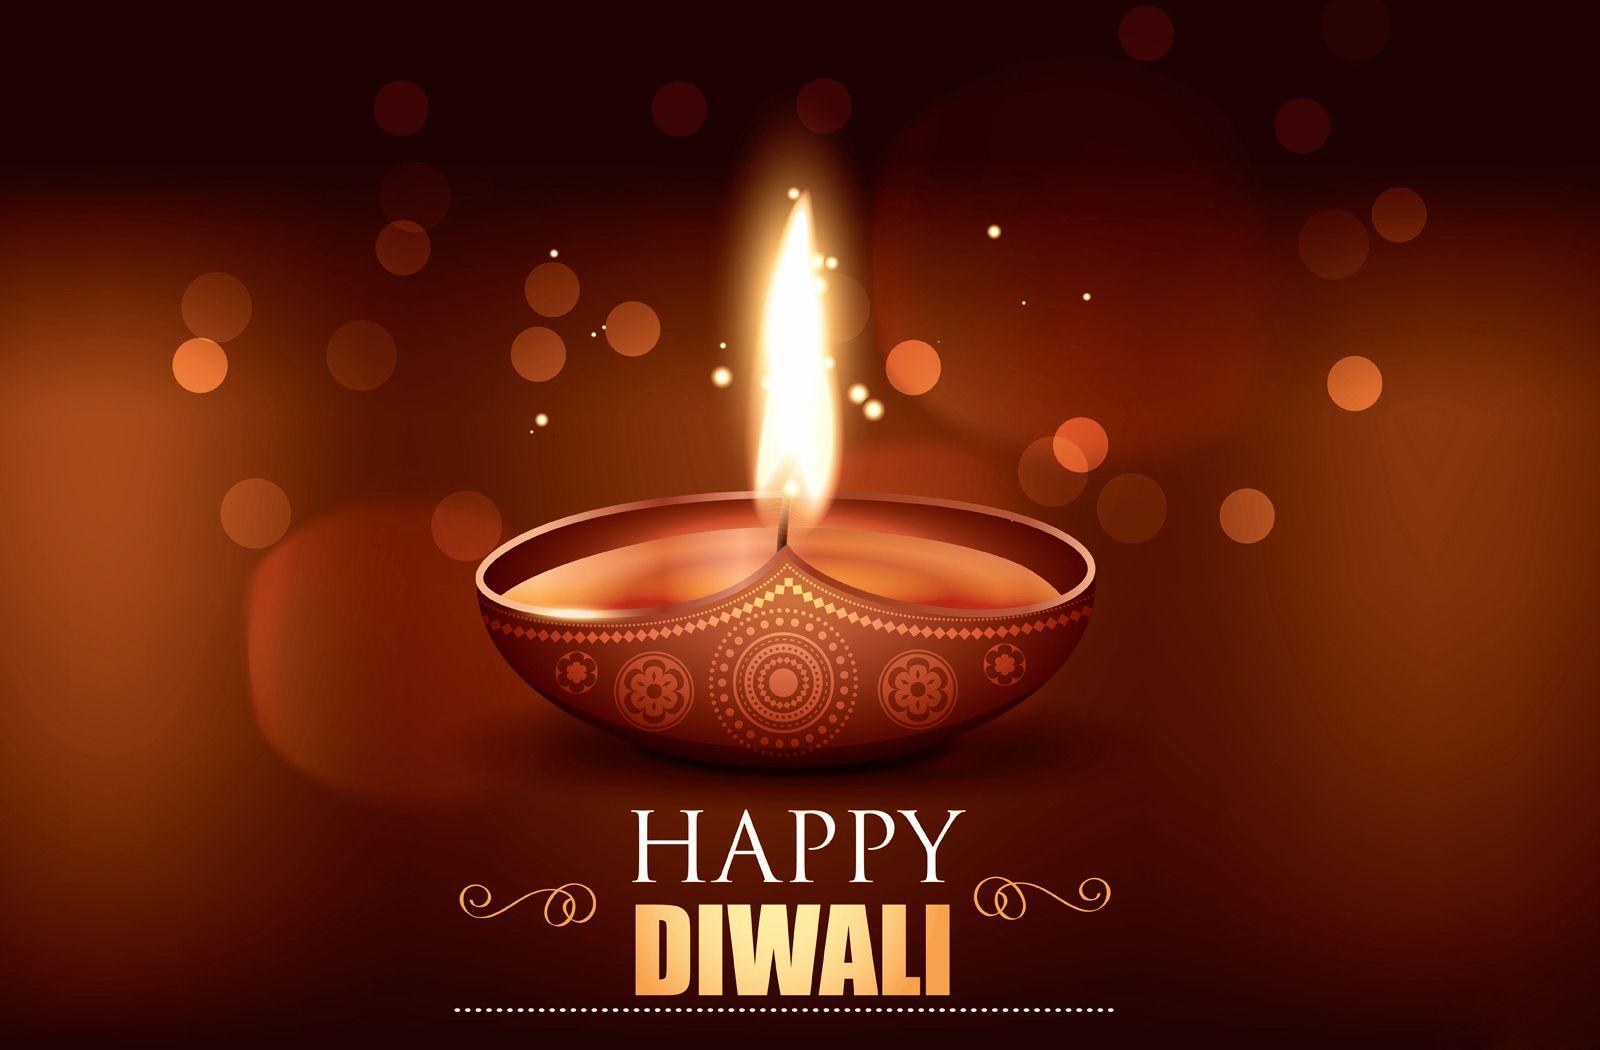 Download best happy diwali wishes httpwww diwali kristyandbryce Image collections